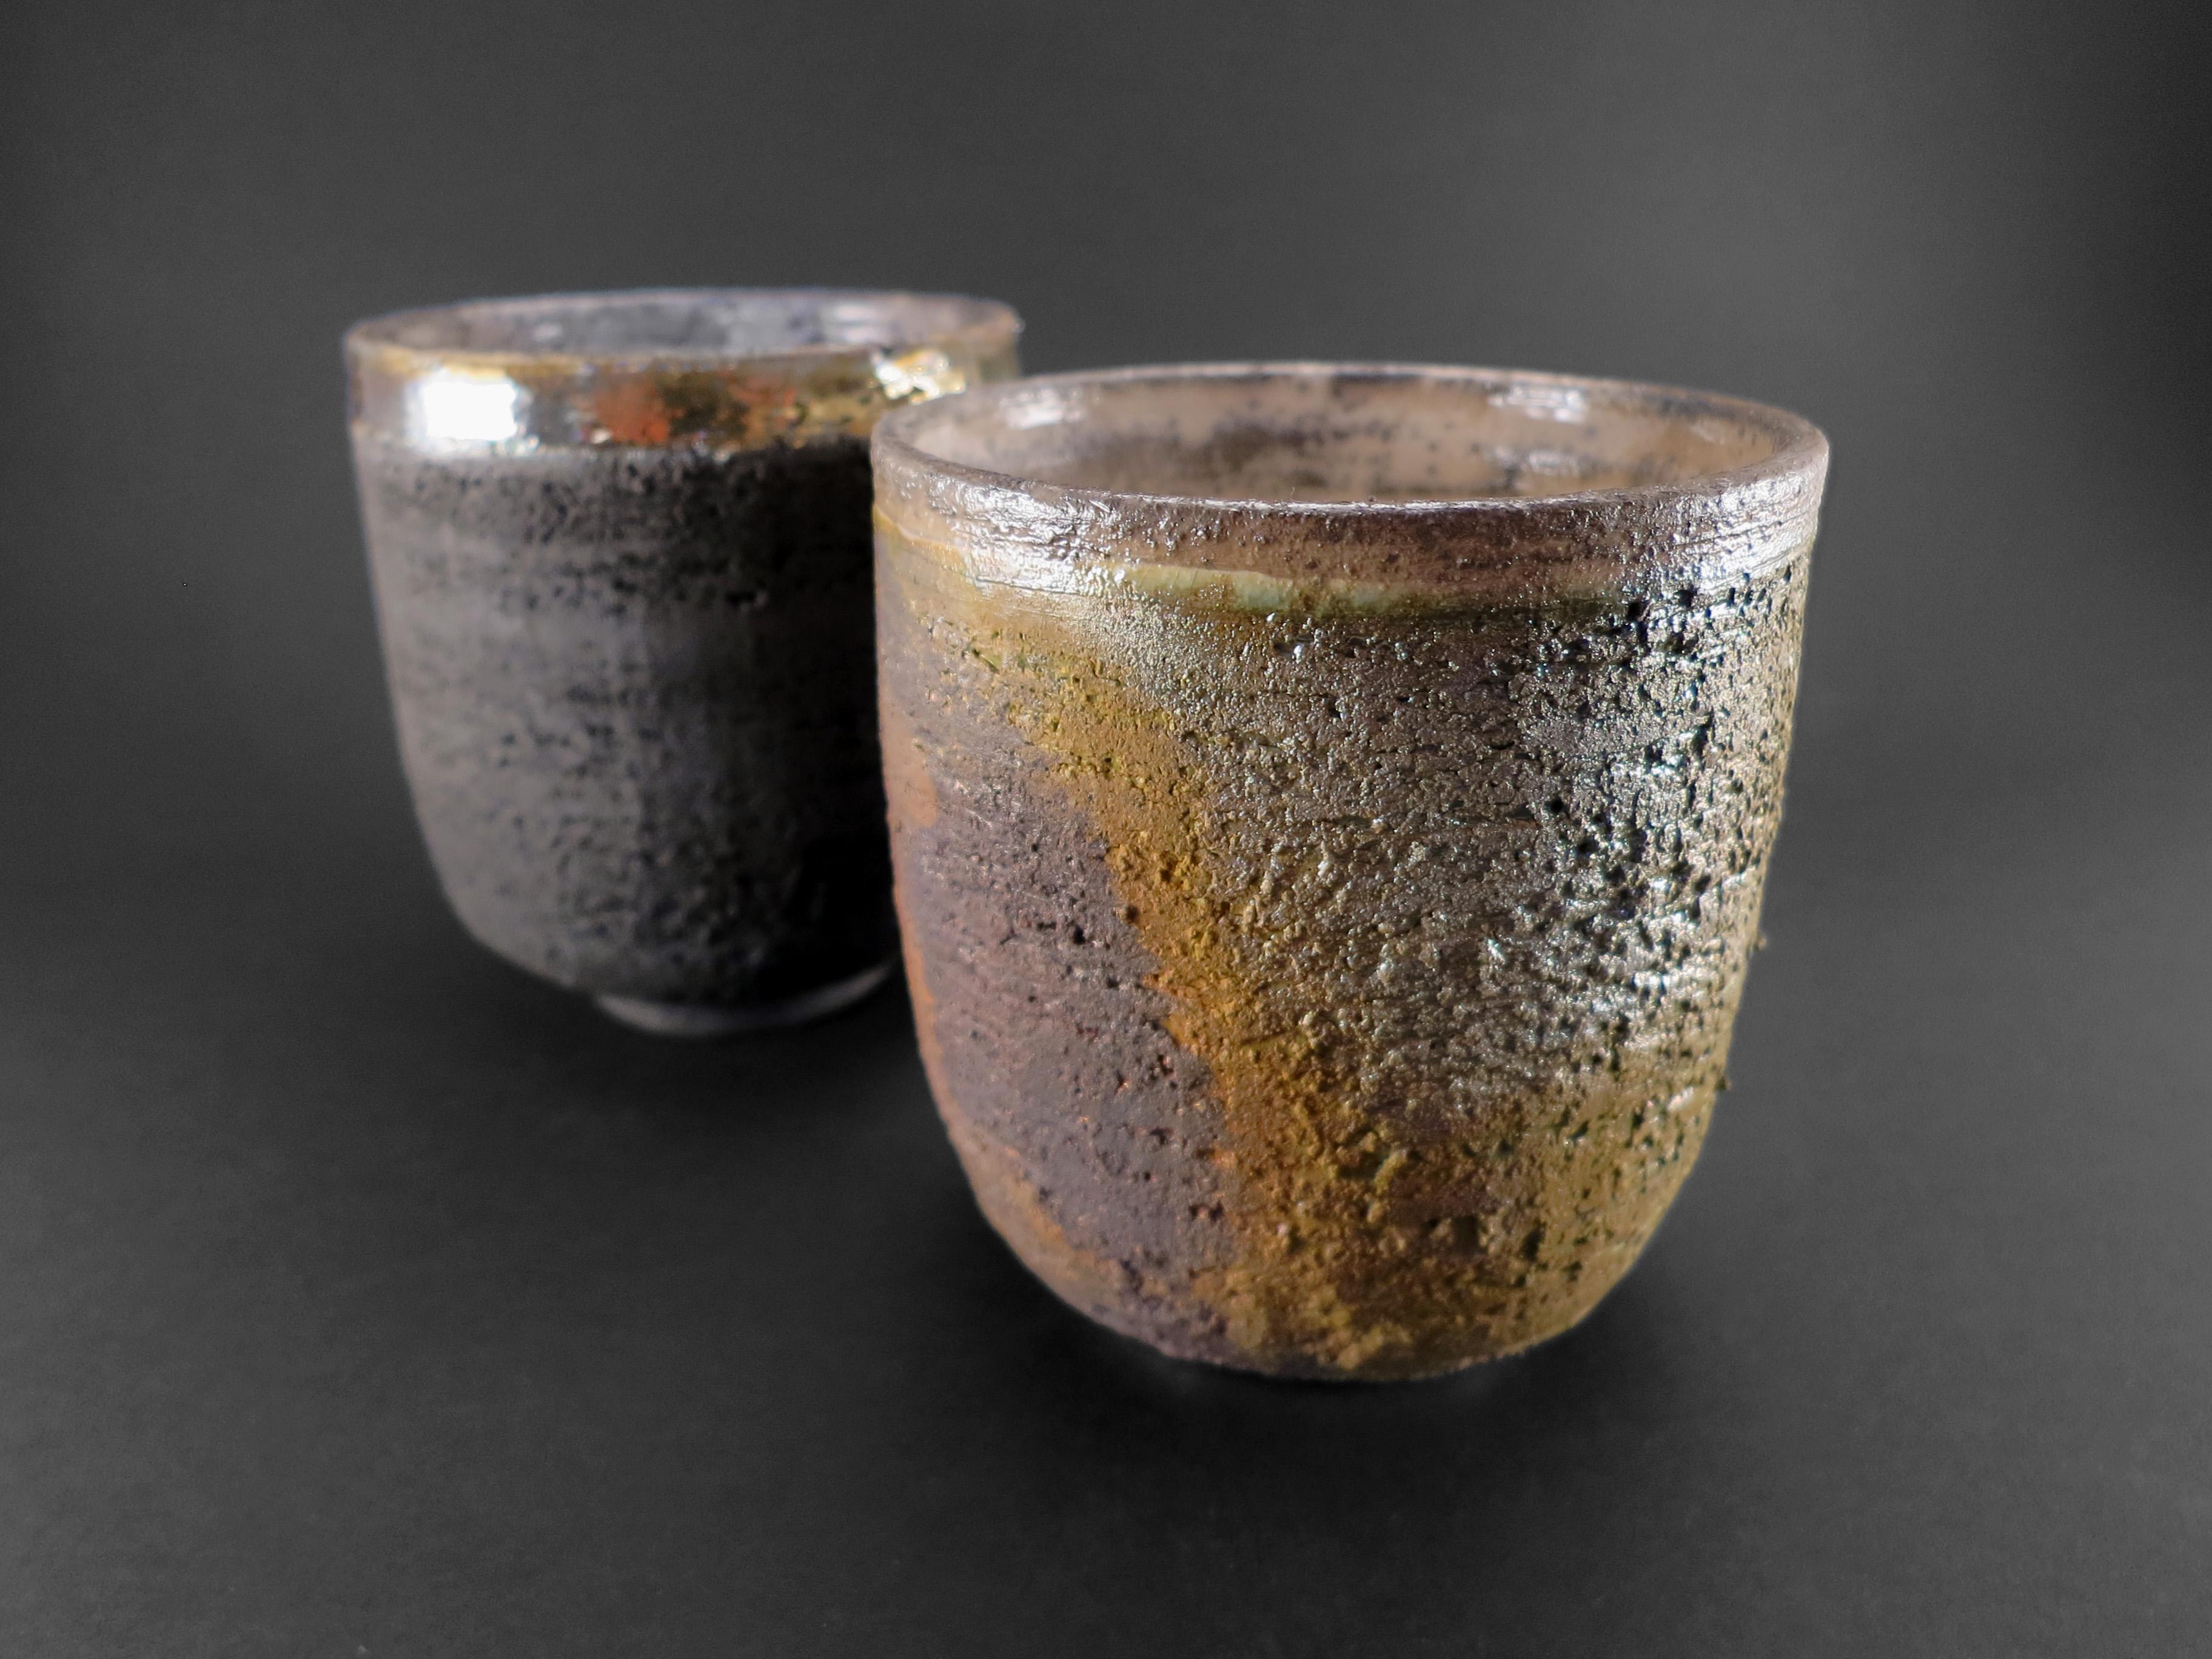 Carbon and Moss Cappuccino Cups - Ildikó Károlyi